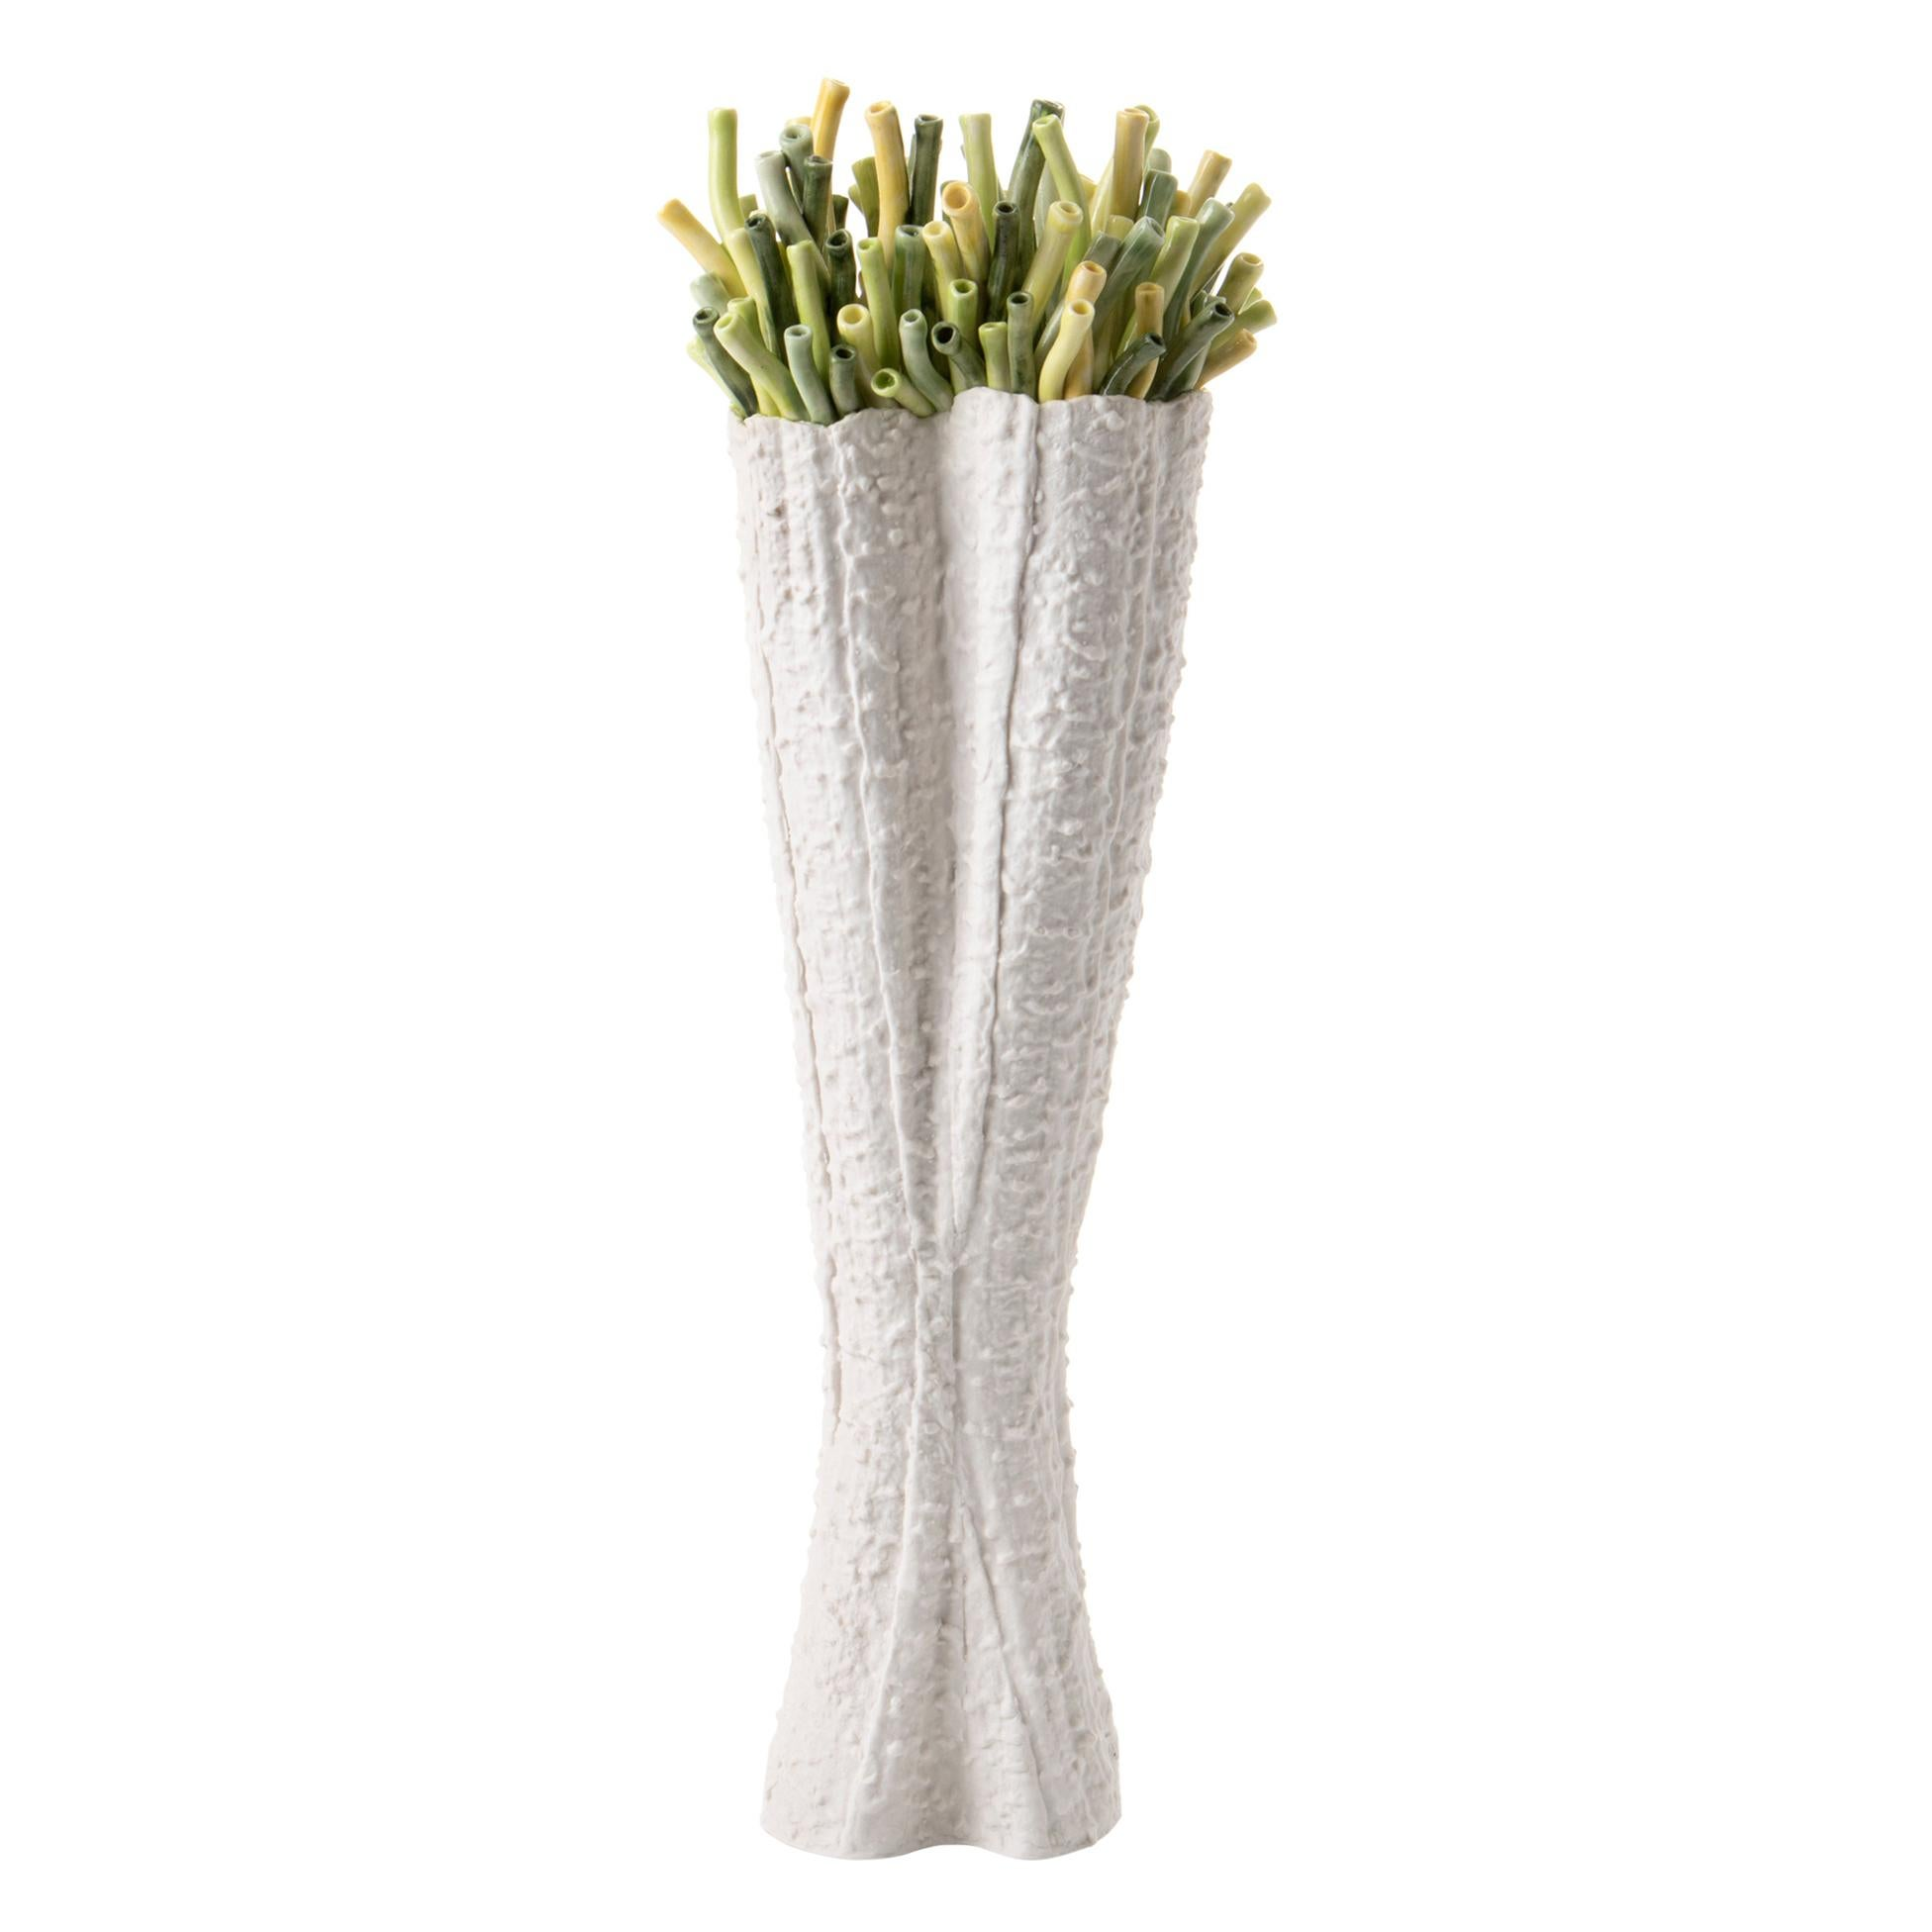 Contemporary Porcelain White Vase Green Corals Sea Ceramic Handmade Italy Fos